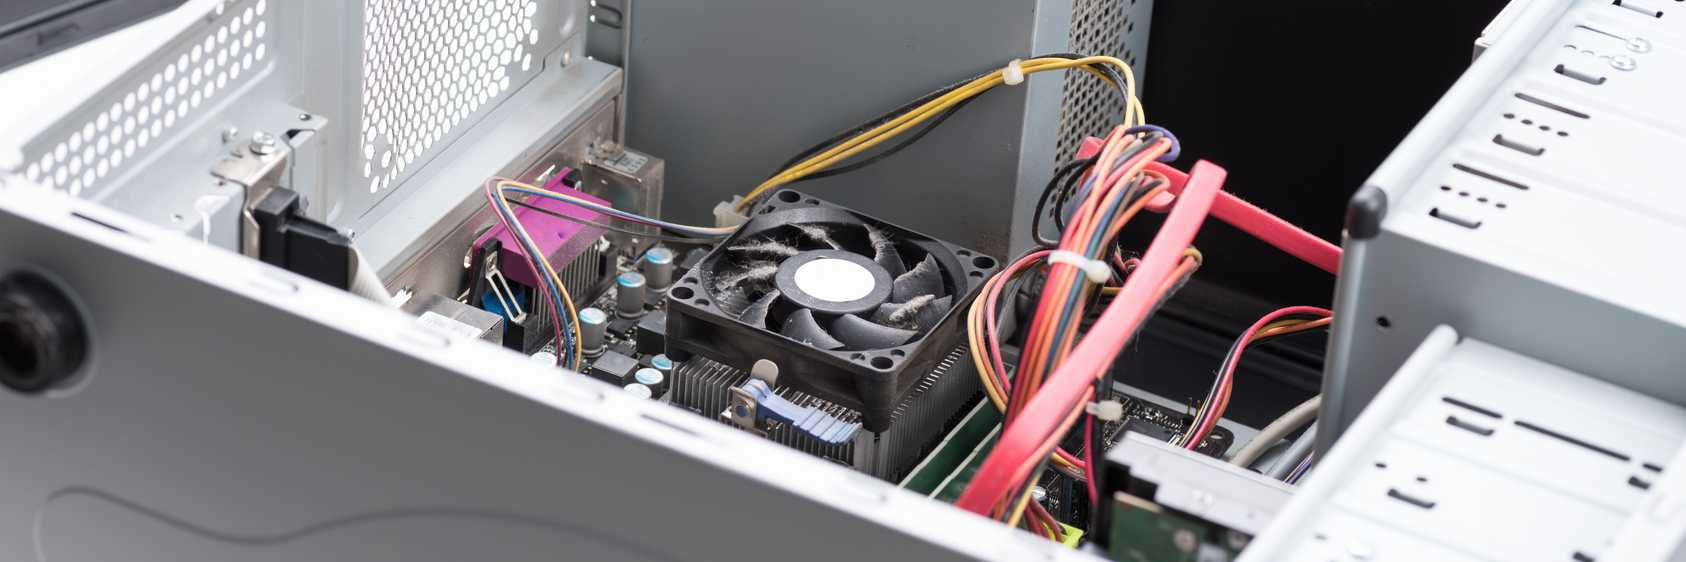 Norm's Computer Services